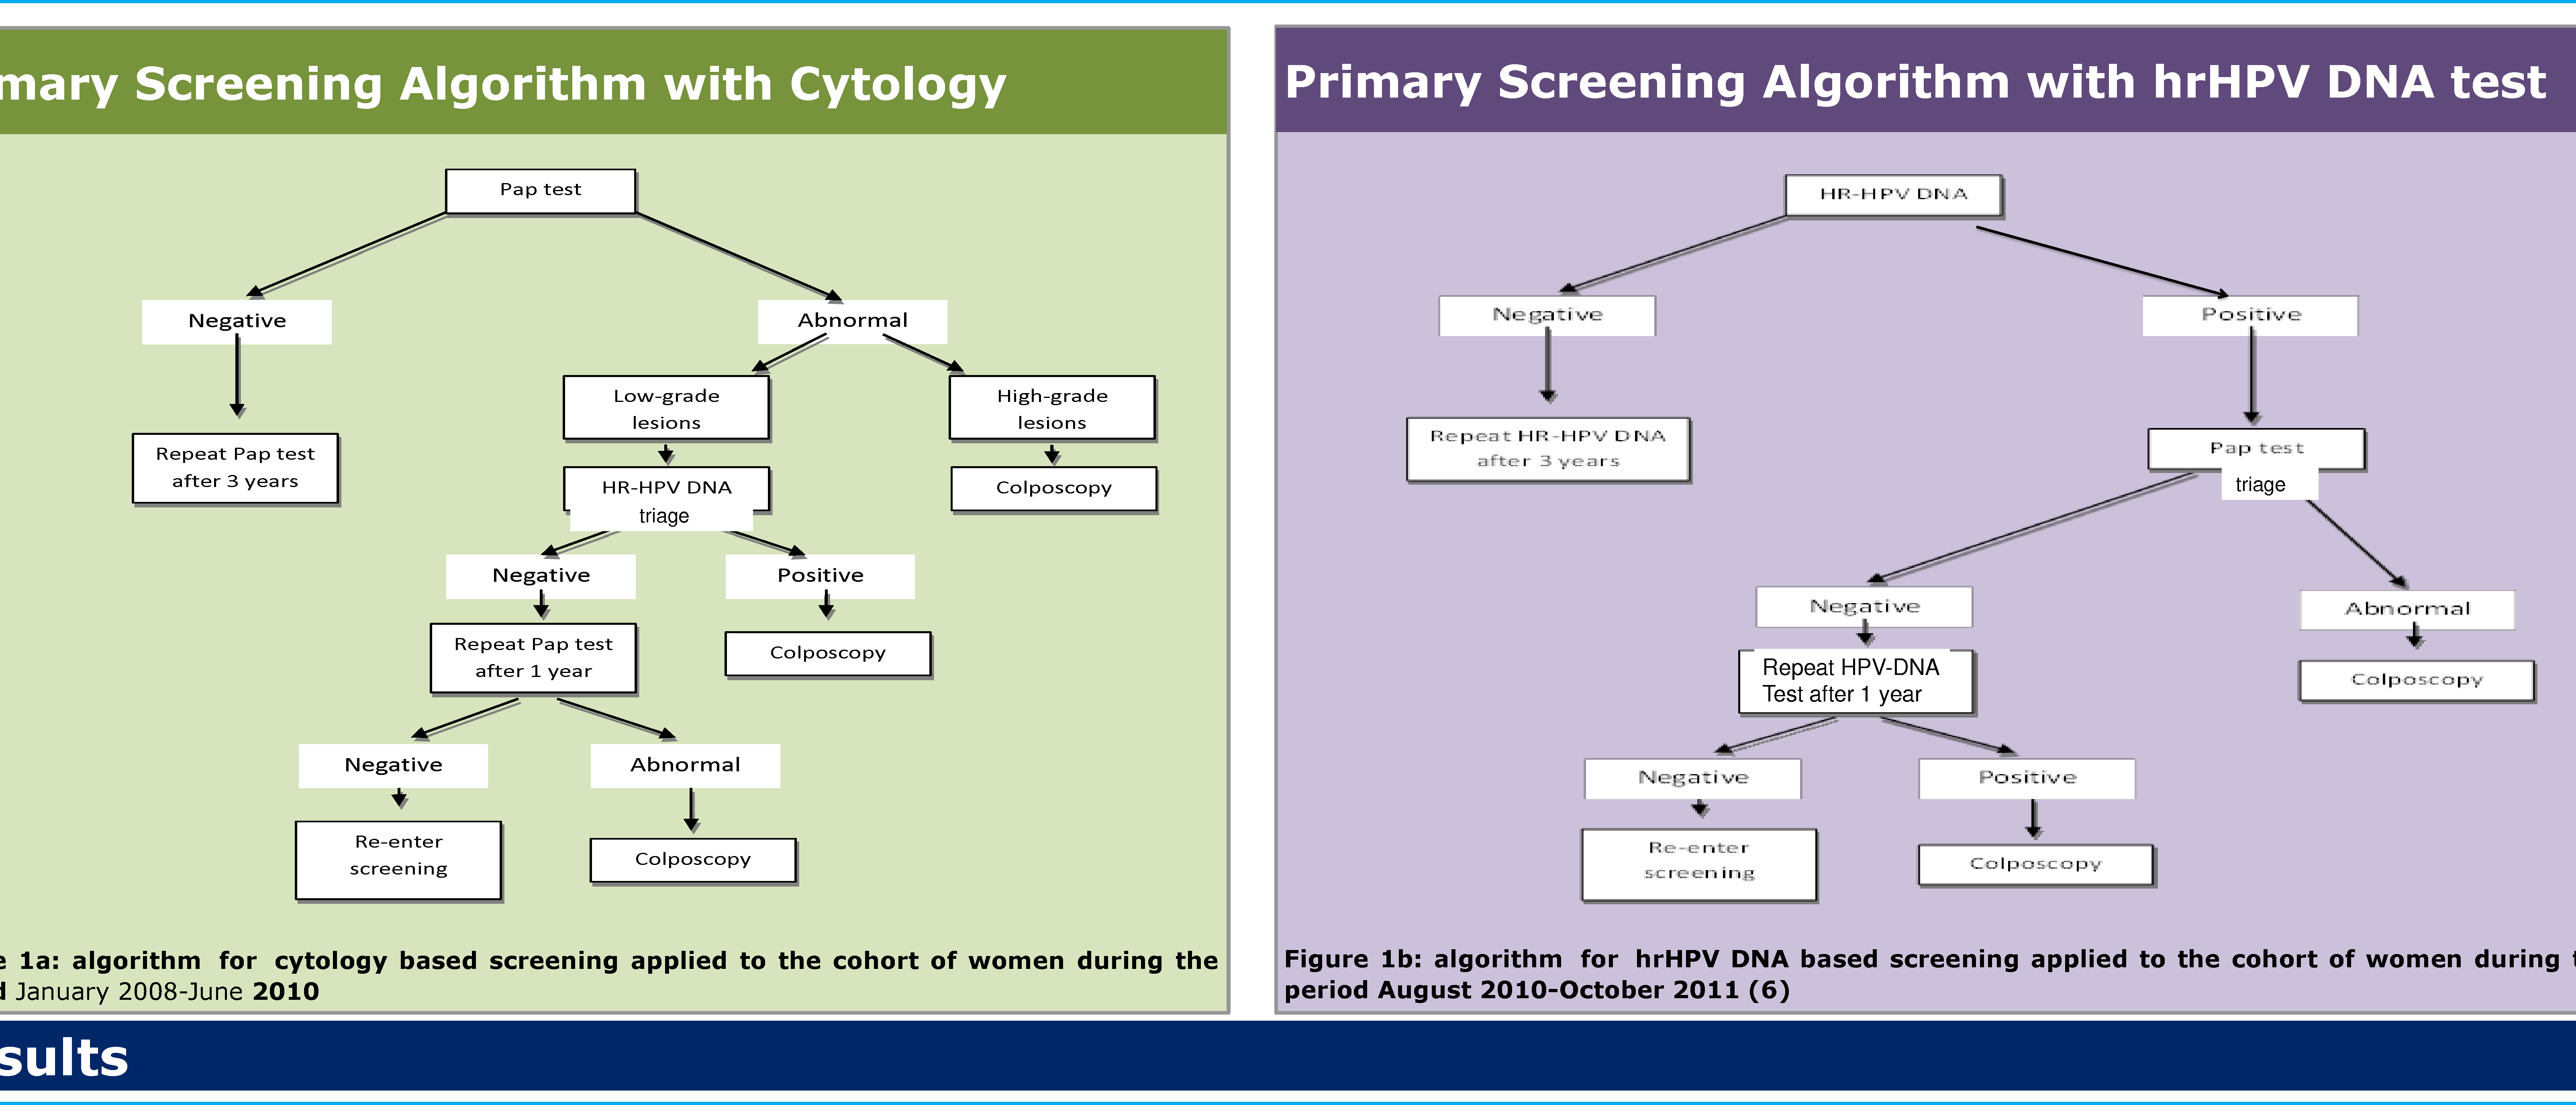 human papillomavirus testing in primary screening